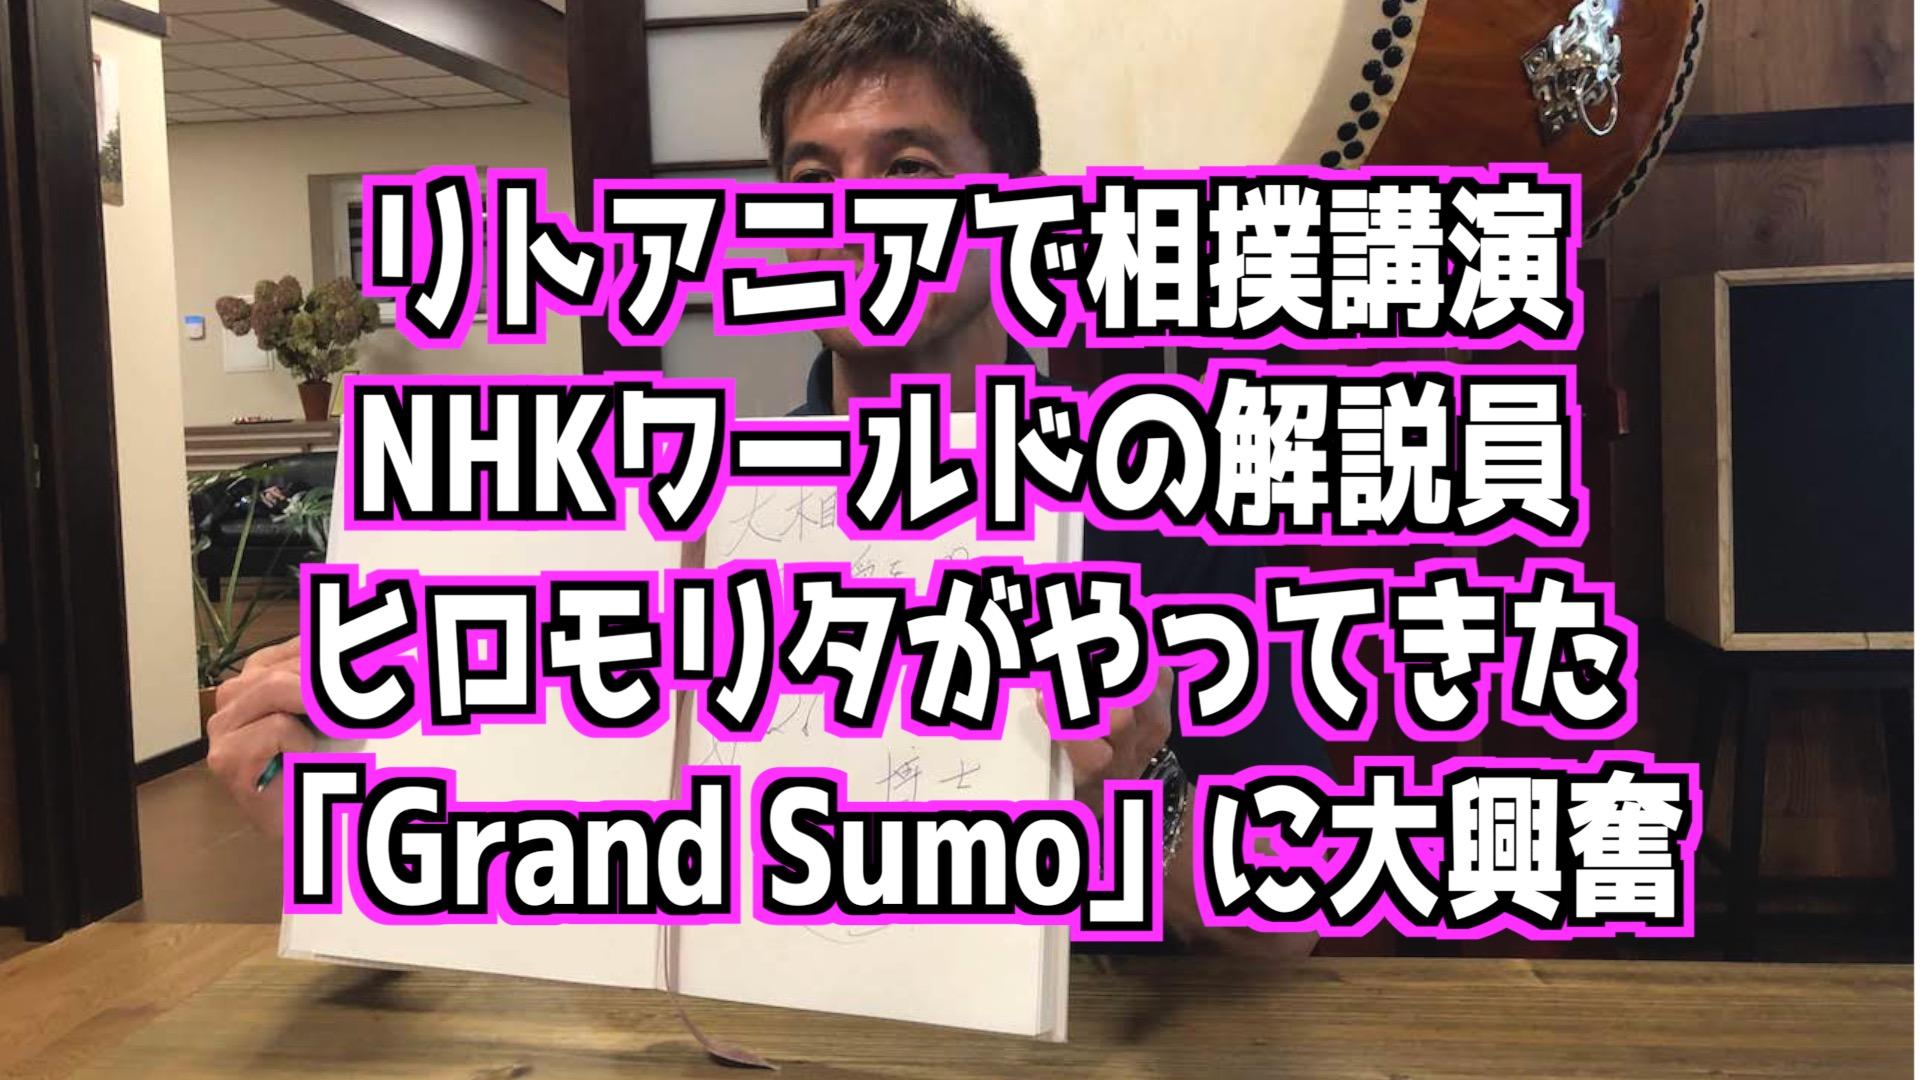 nhk 大相撲 動画 アプリ